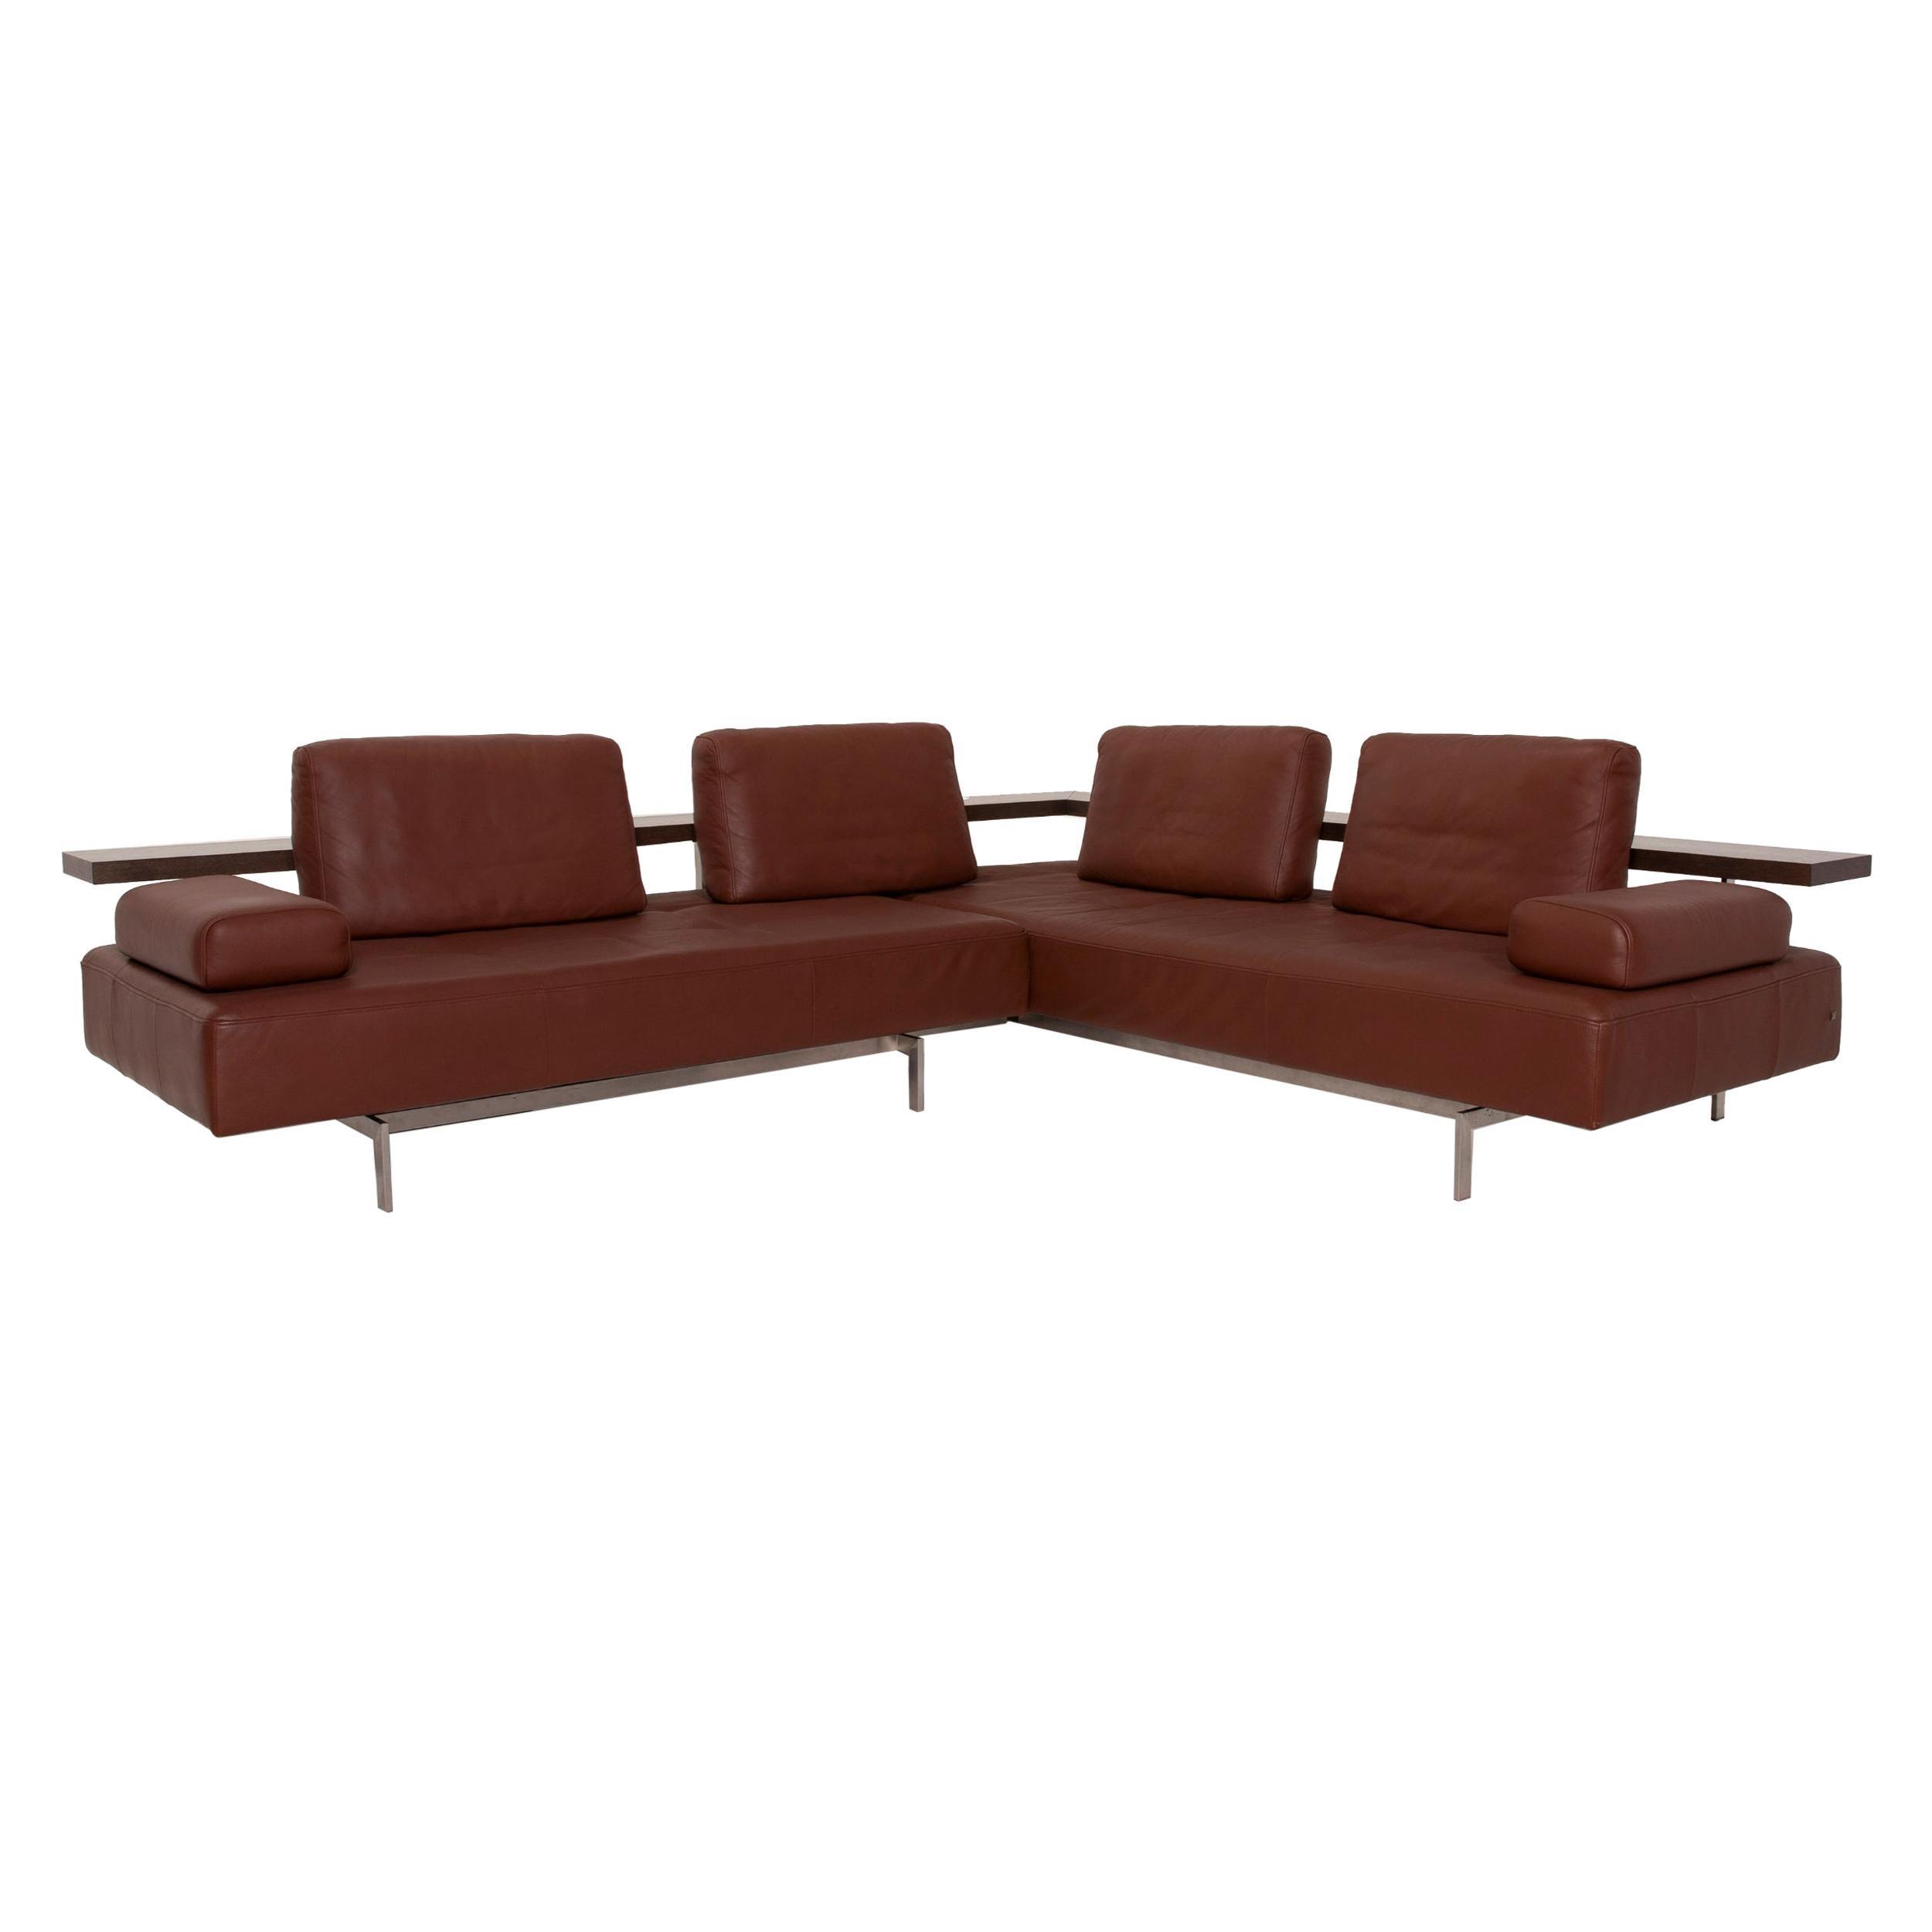 Rolf Benz Dono Leather Sofa Brown Corner Sofa